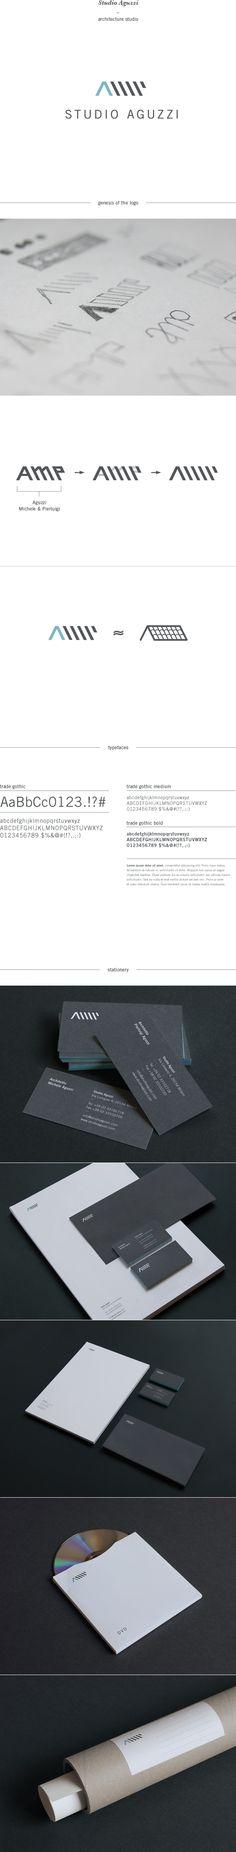 Like this Branding - Studio Aguzzi - Architecture Studio by Giorgia Smiraglia Brand Identity Design, Graphic Design Branding, Corporate Design, Identity Branding, Visual Identity, Typography Logo, Typography Design, Logo Inspiration, Beste Logos